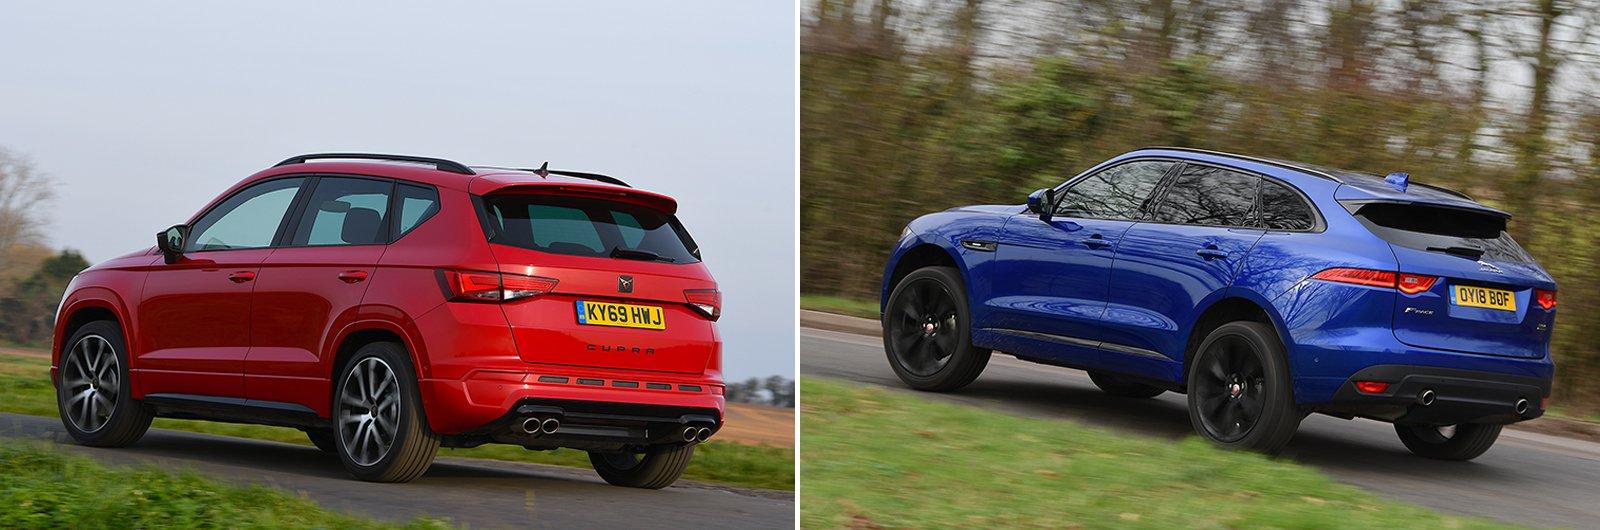 New Cupra Ateca vs used Jaguar F-Pace rear corner